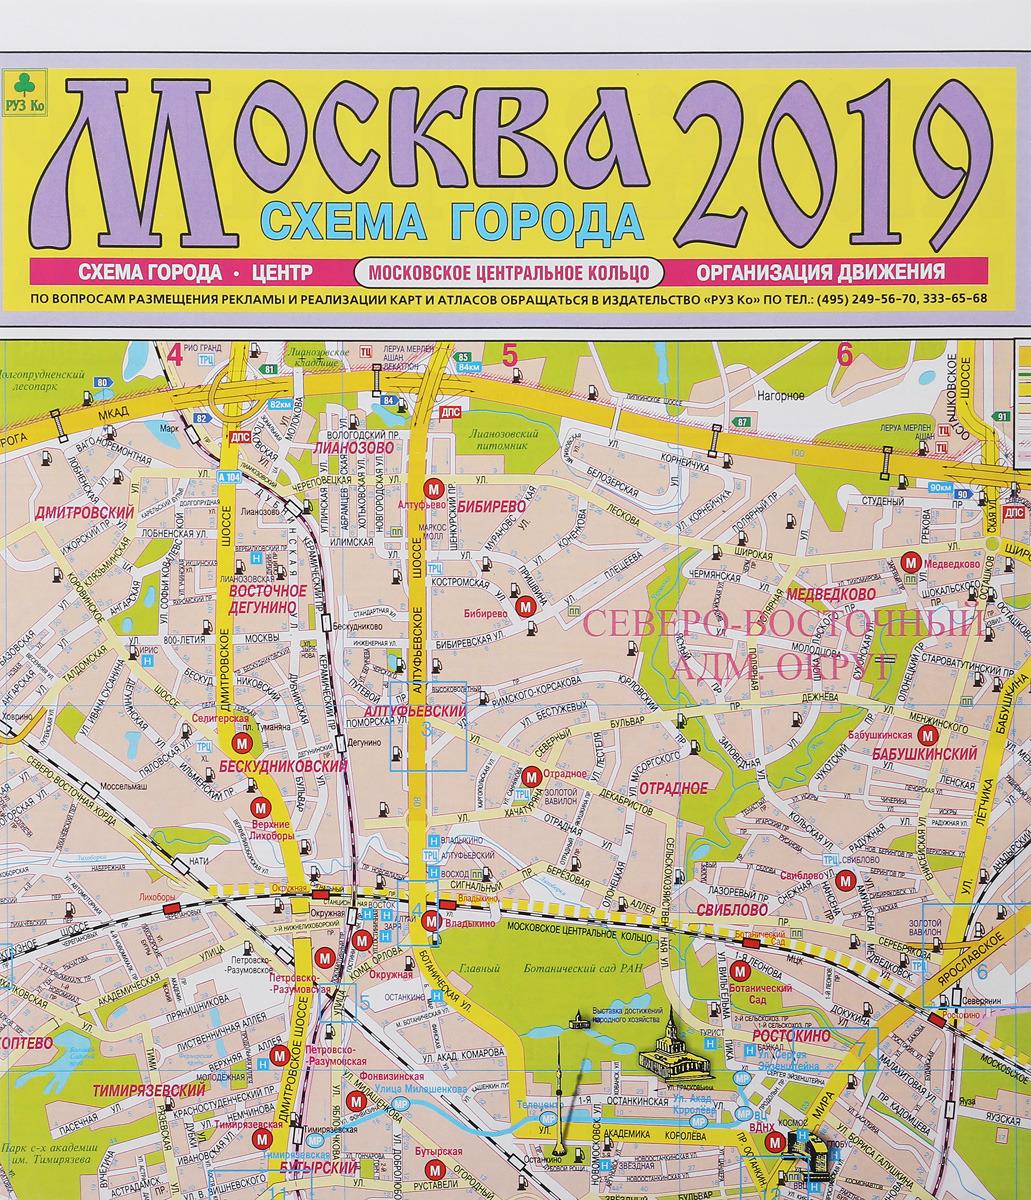 Москва. Схема города. Карта авиабилеты гюмри москва